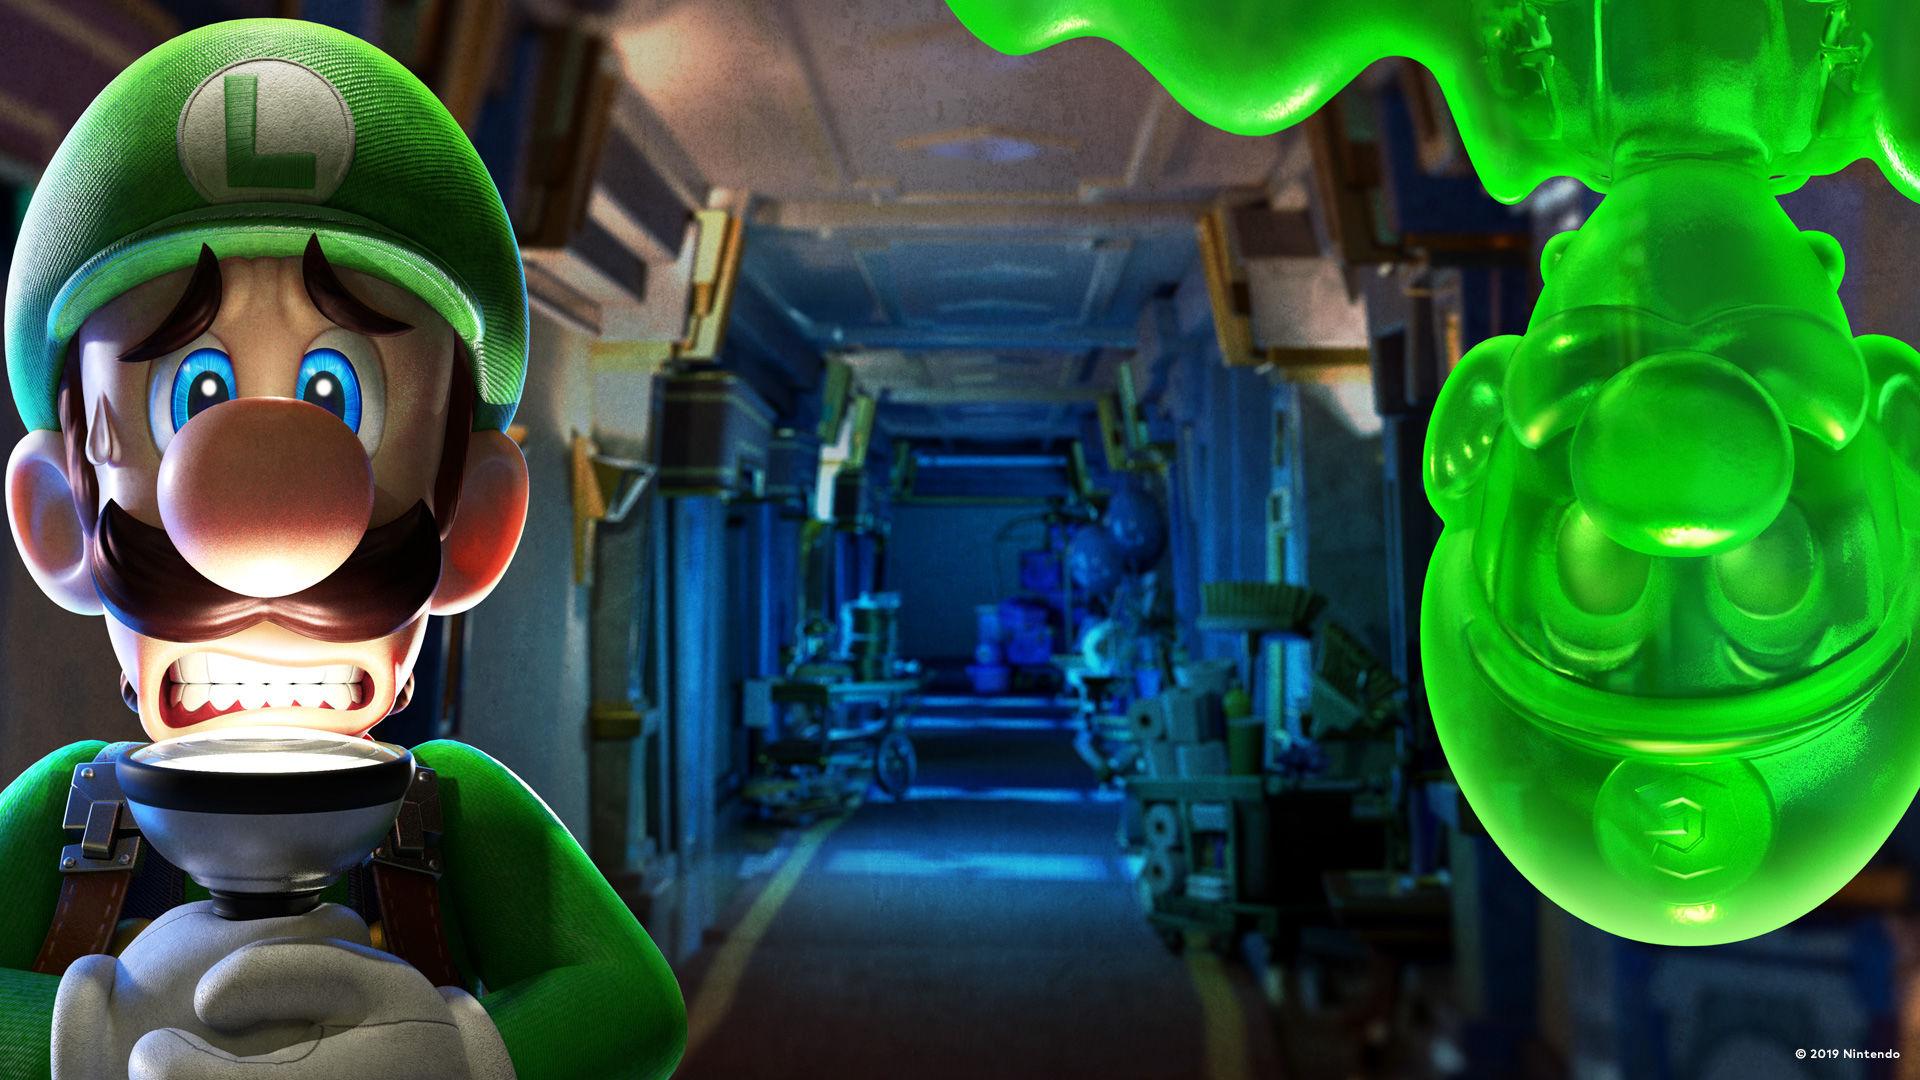 Nintendo says it will turn to technology development